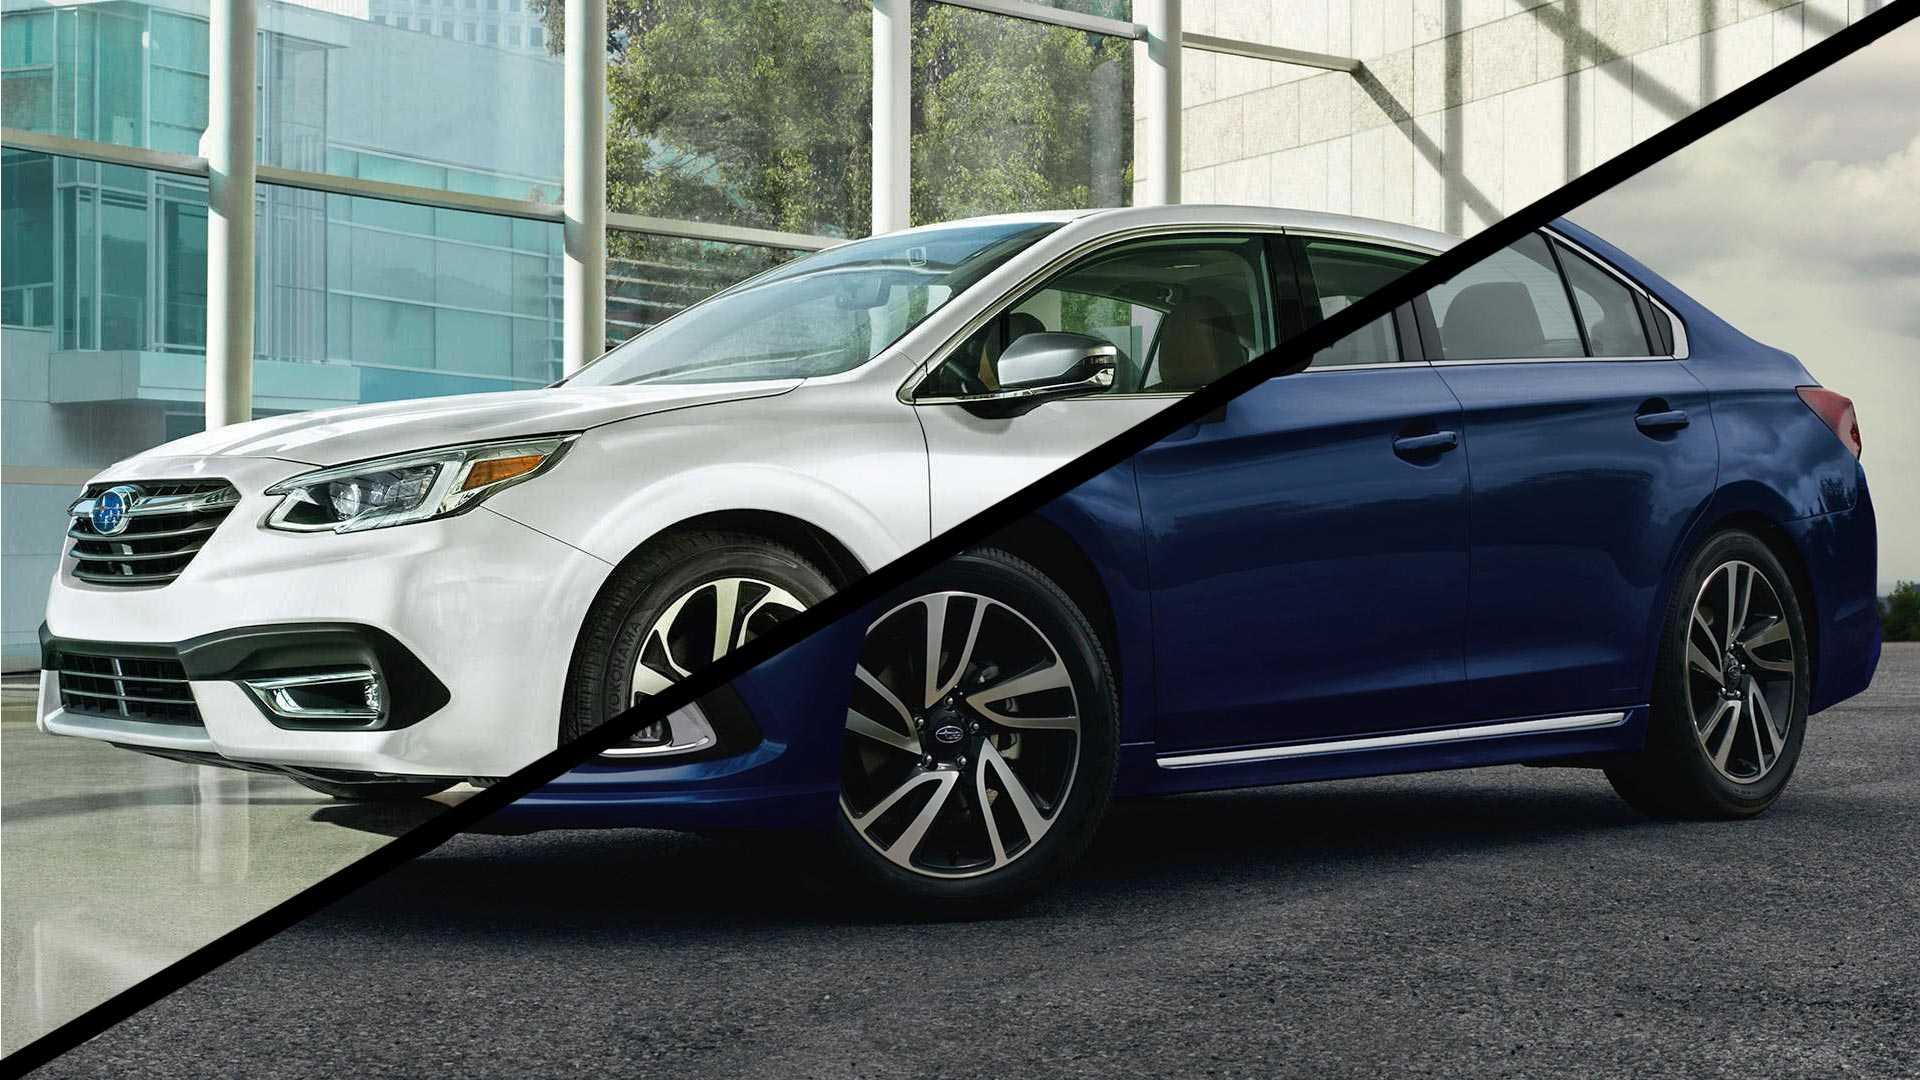 38 Concept of 2020 Subaru Legacy Price Spy Shoot for 2020 Subaru Legacy Price